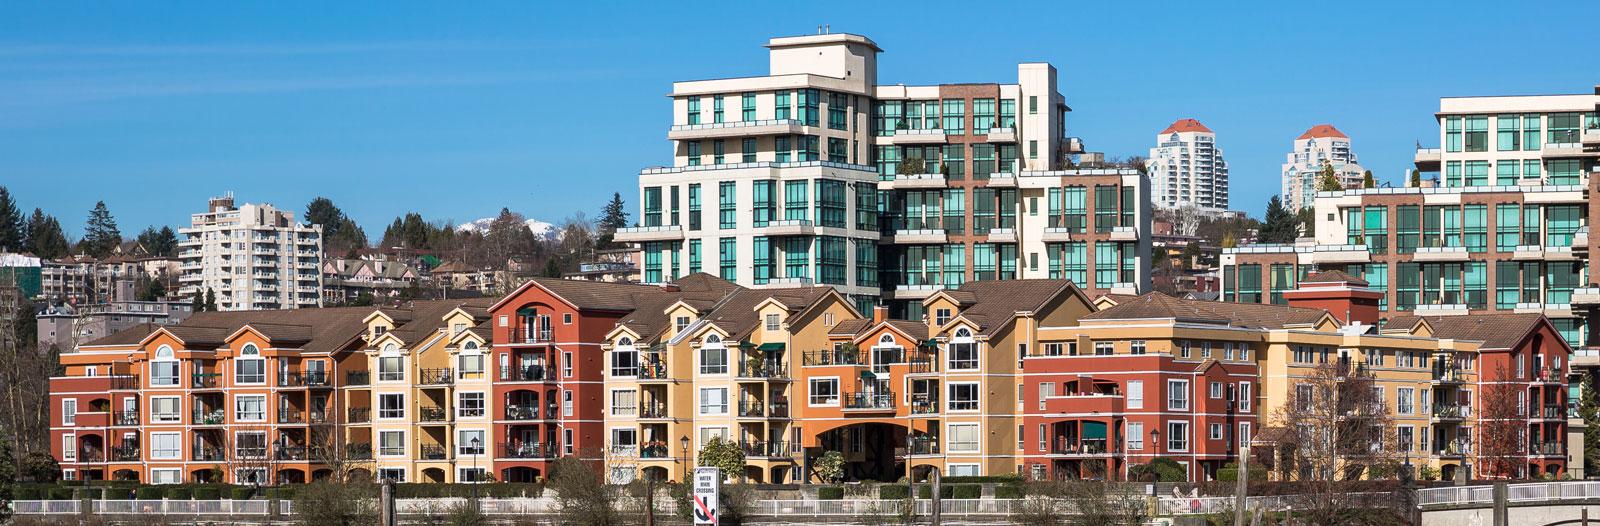 multifamily-apartments.jpg